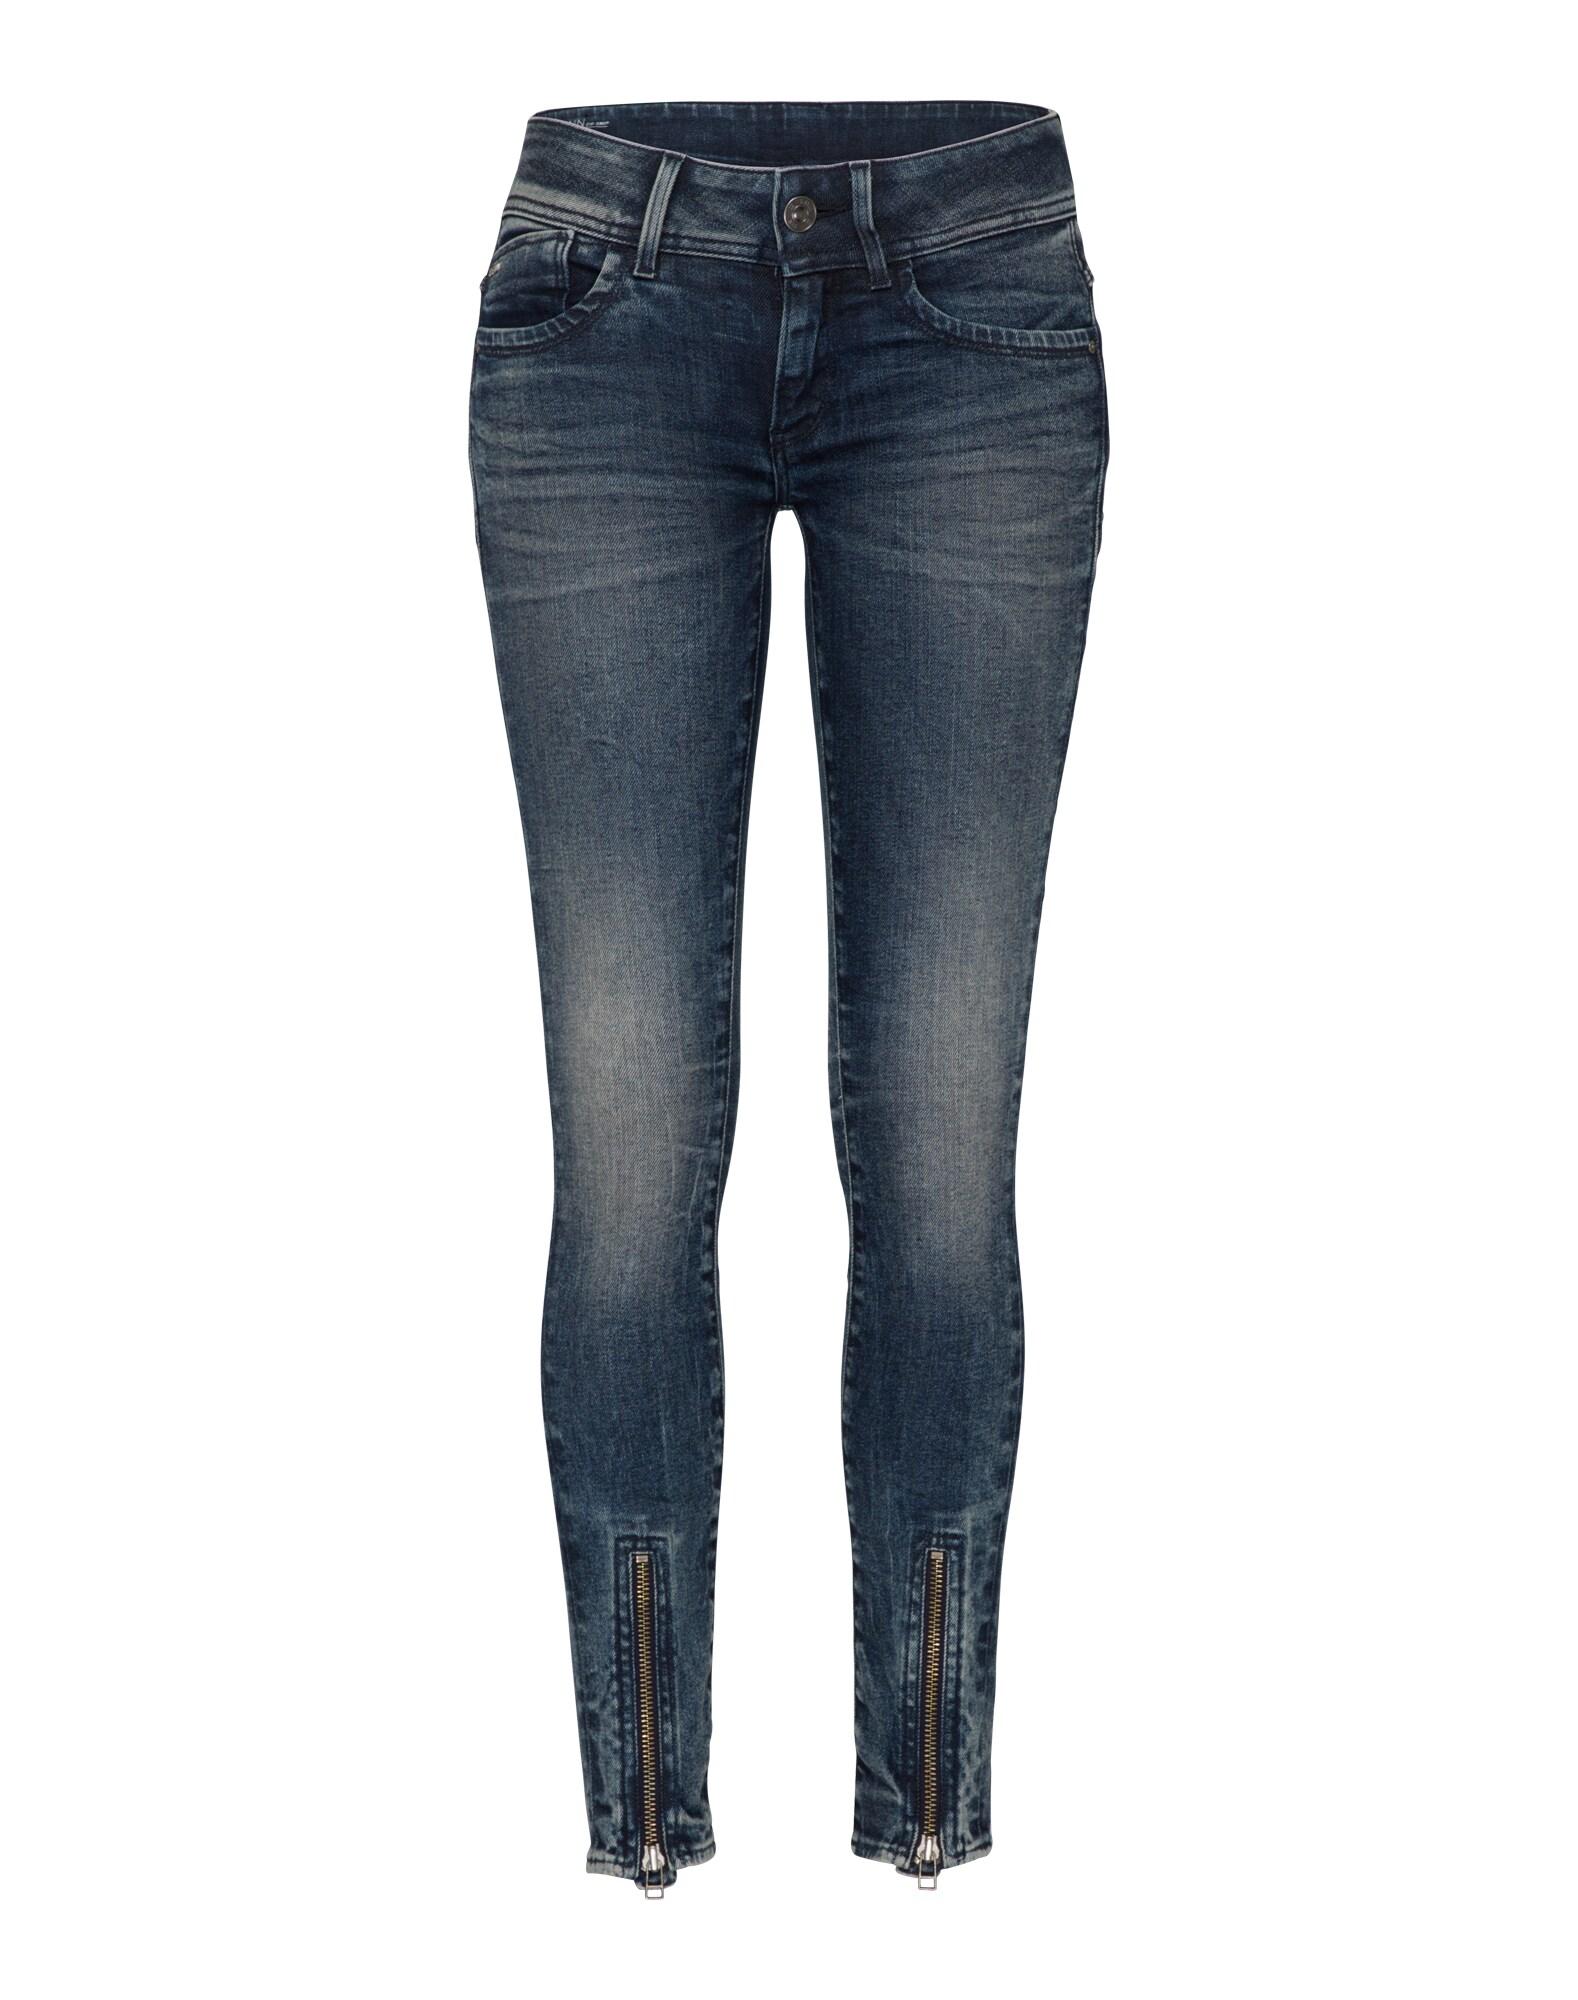 G-STAR RAW Dames Jeans Lynn Zip Grip Mid Skinny Wmn blue denim